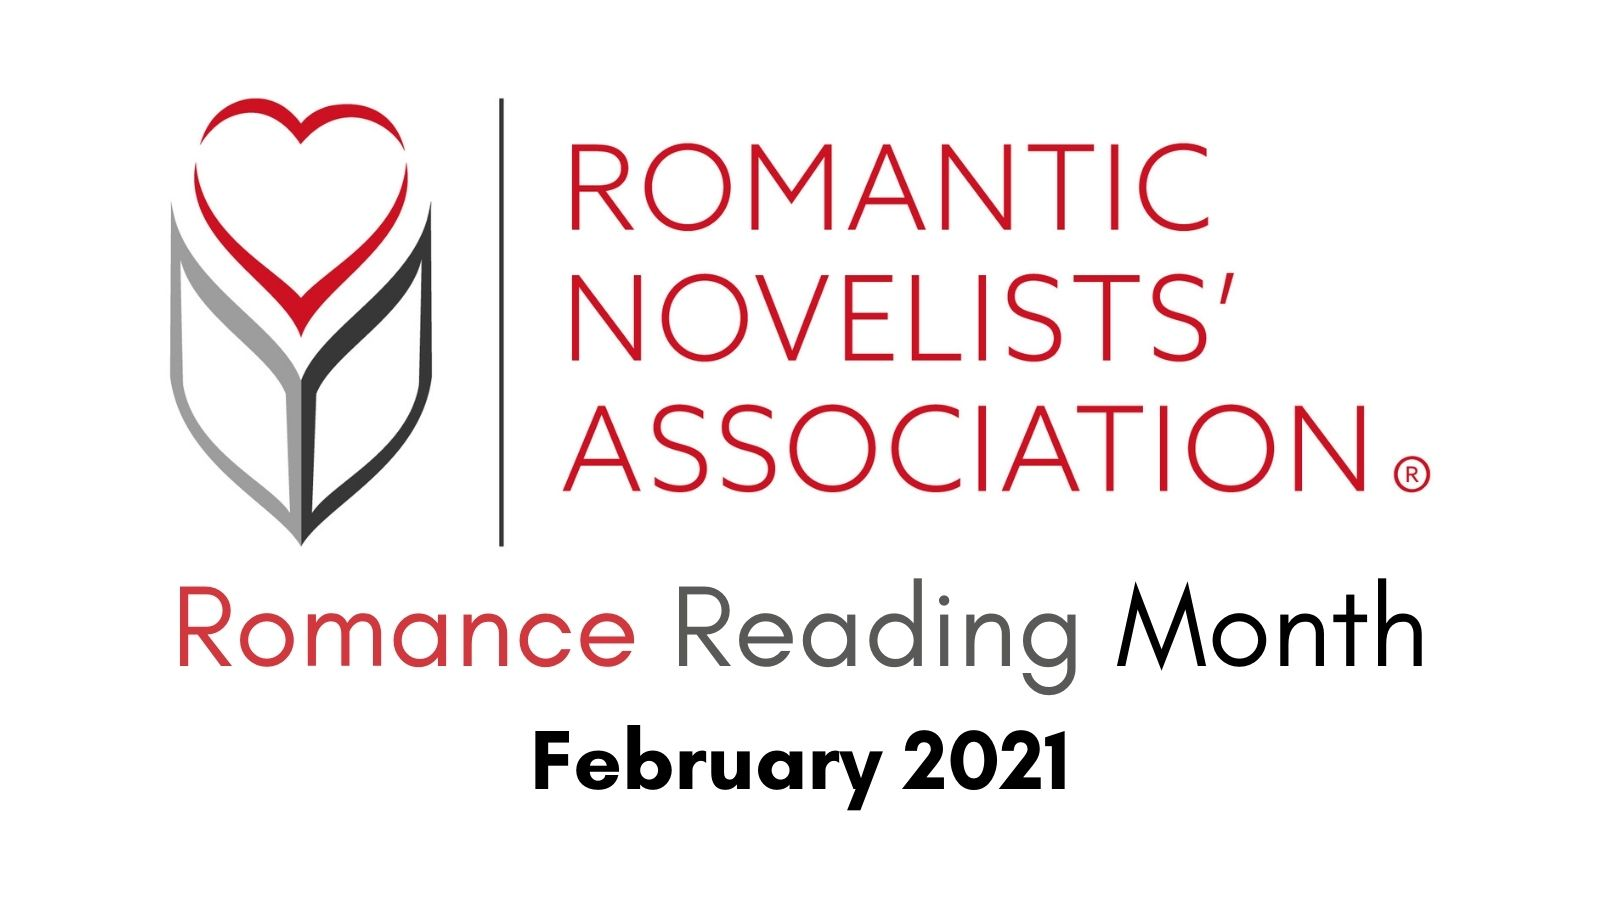 Romance Reading Month February 2021